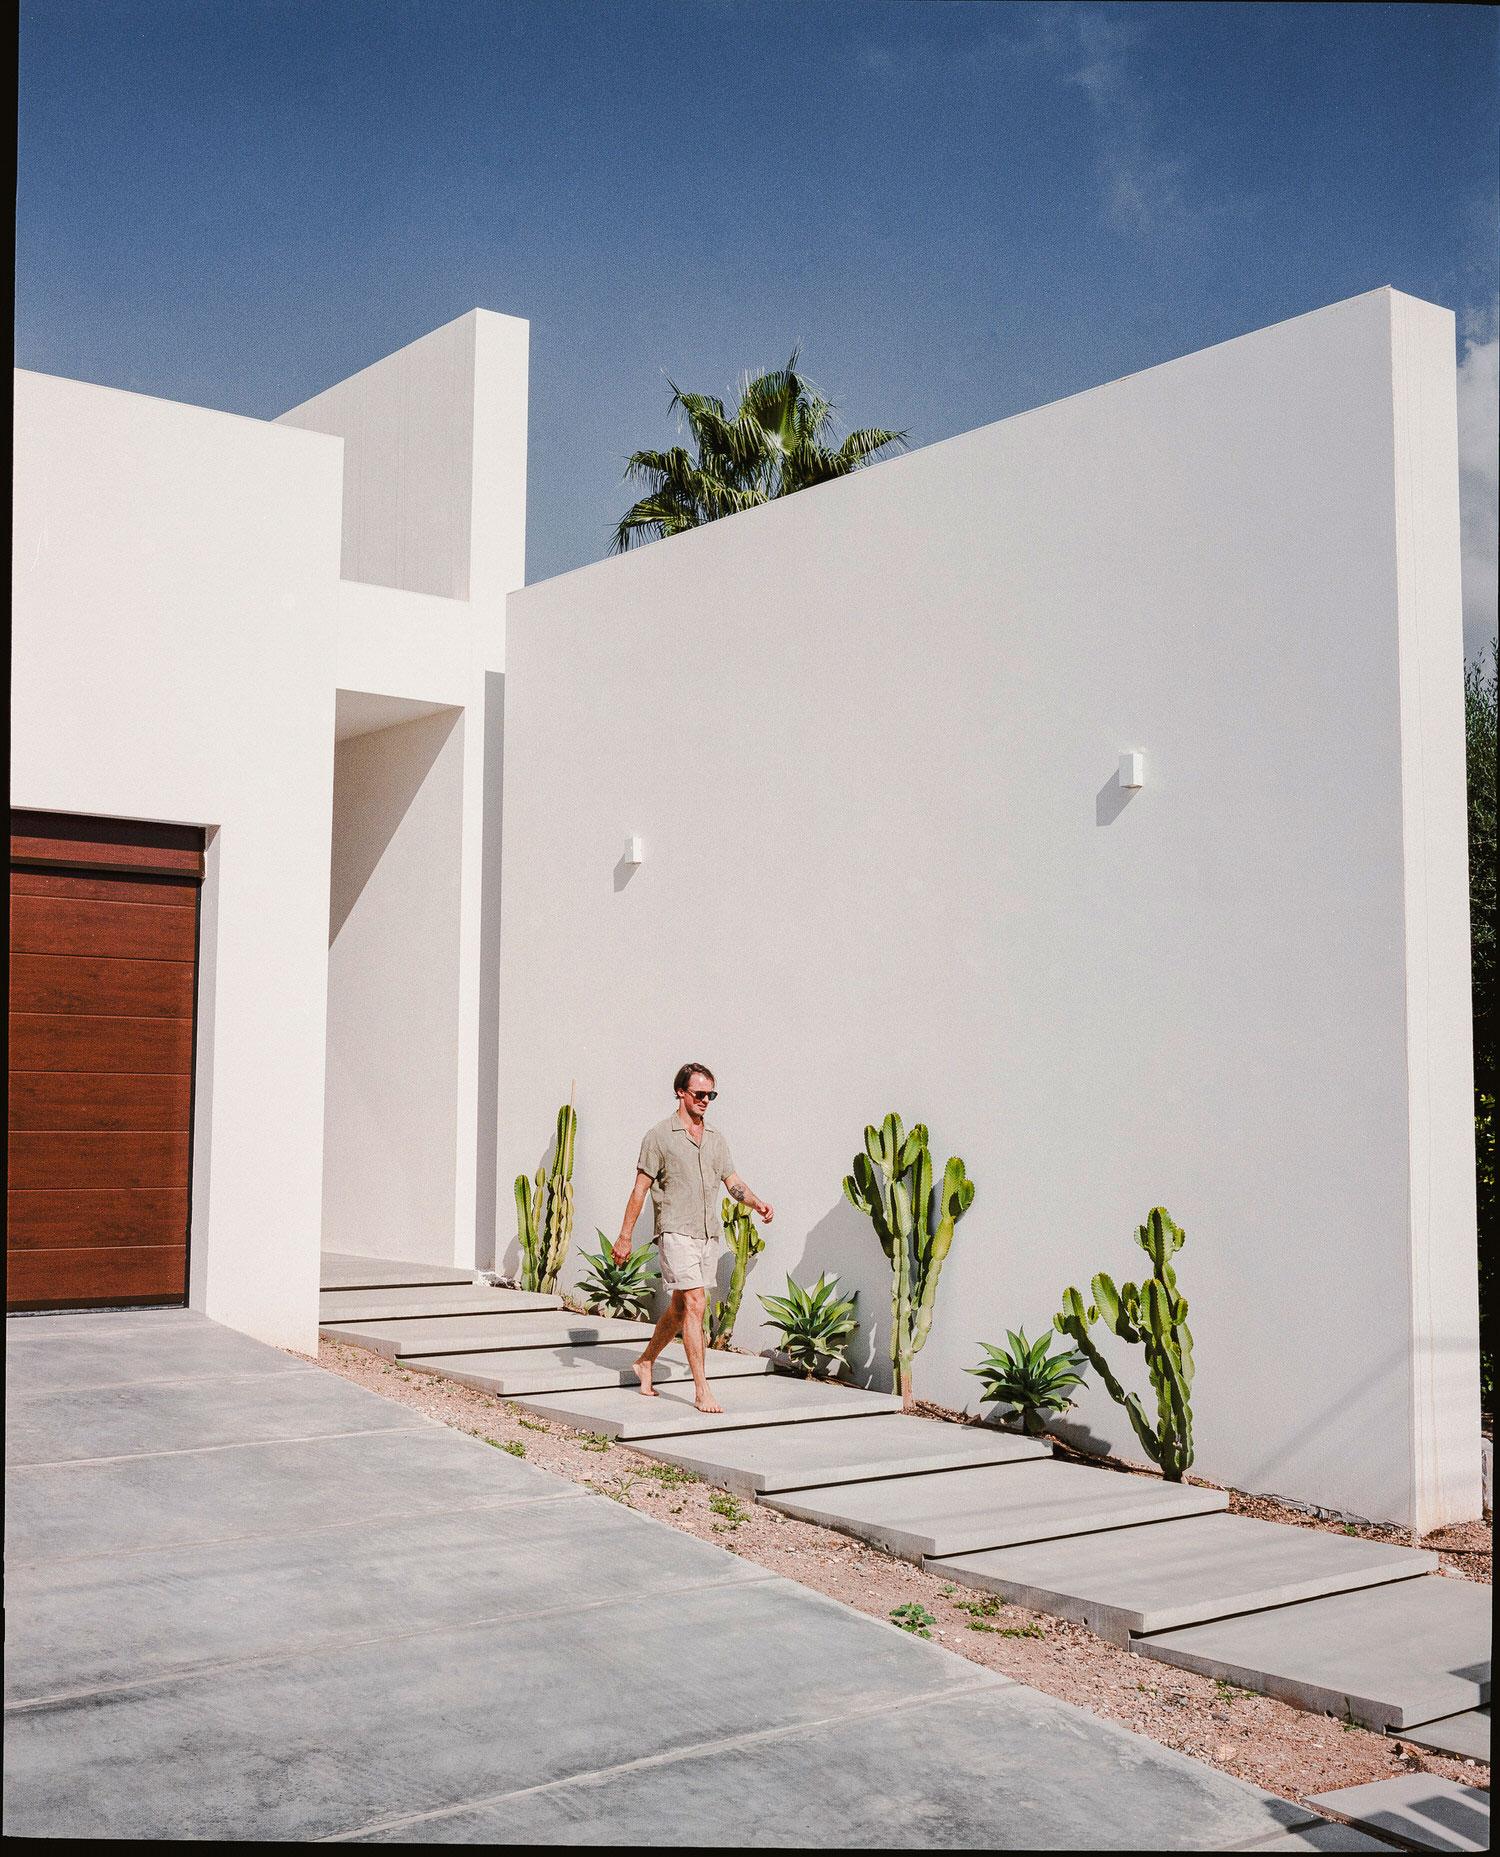 PDM Holiday House in Majorca by Paradowski Studio.